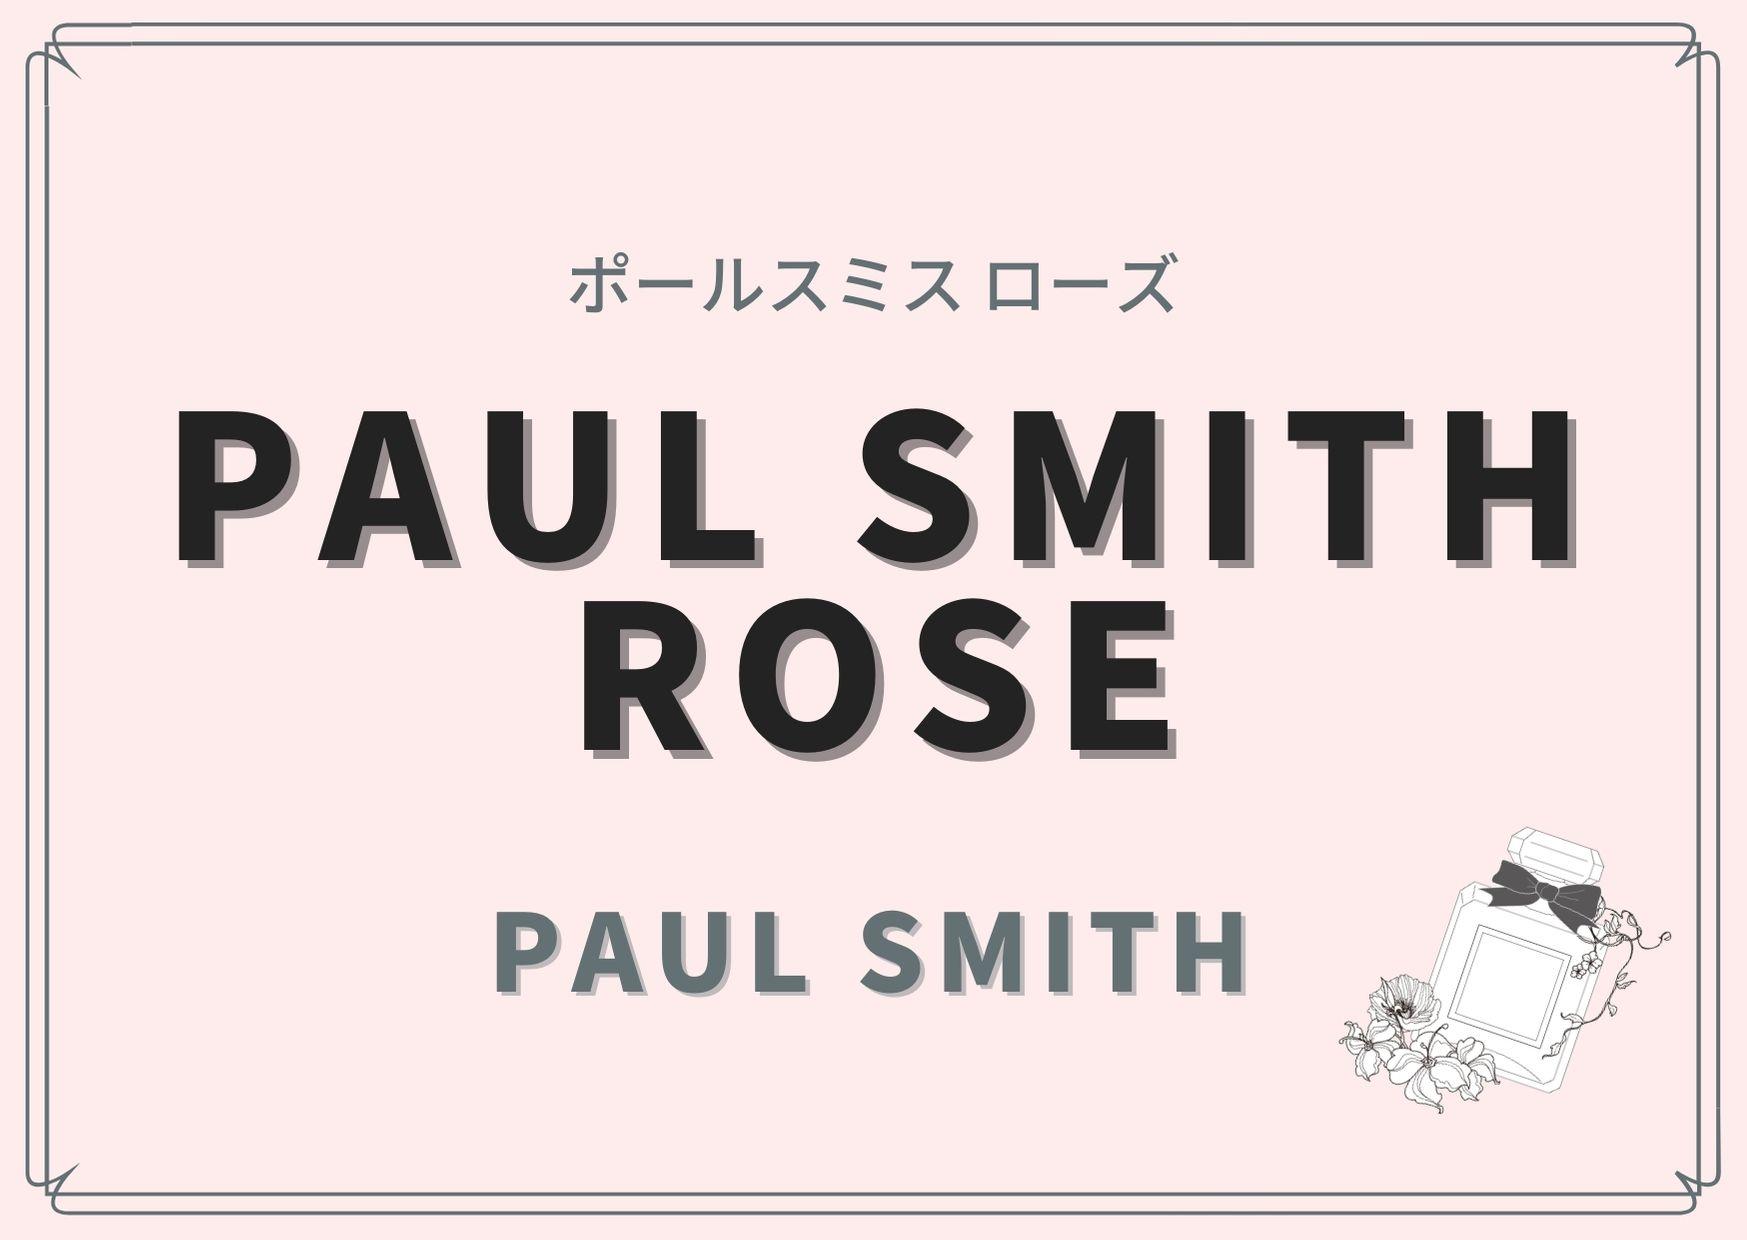 PAUL SMITH ROSE(ポールスミス ローズ)/PAUL SMITH(ポール スミス)